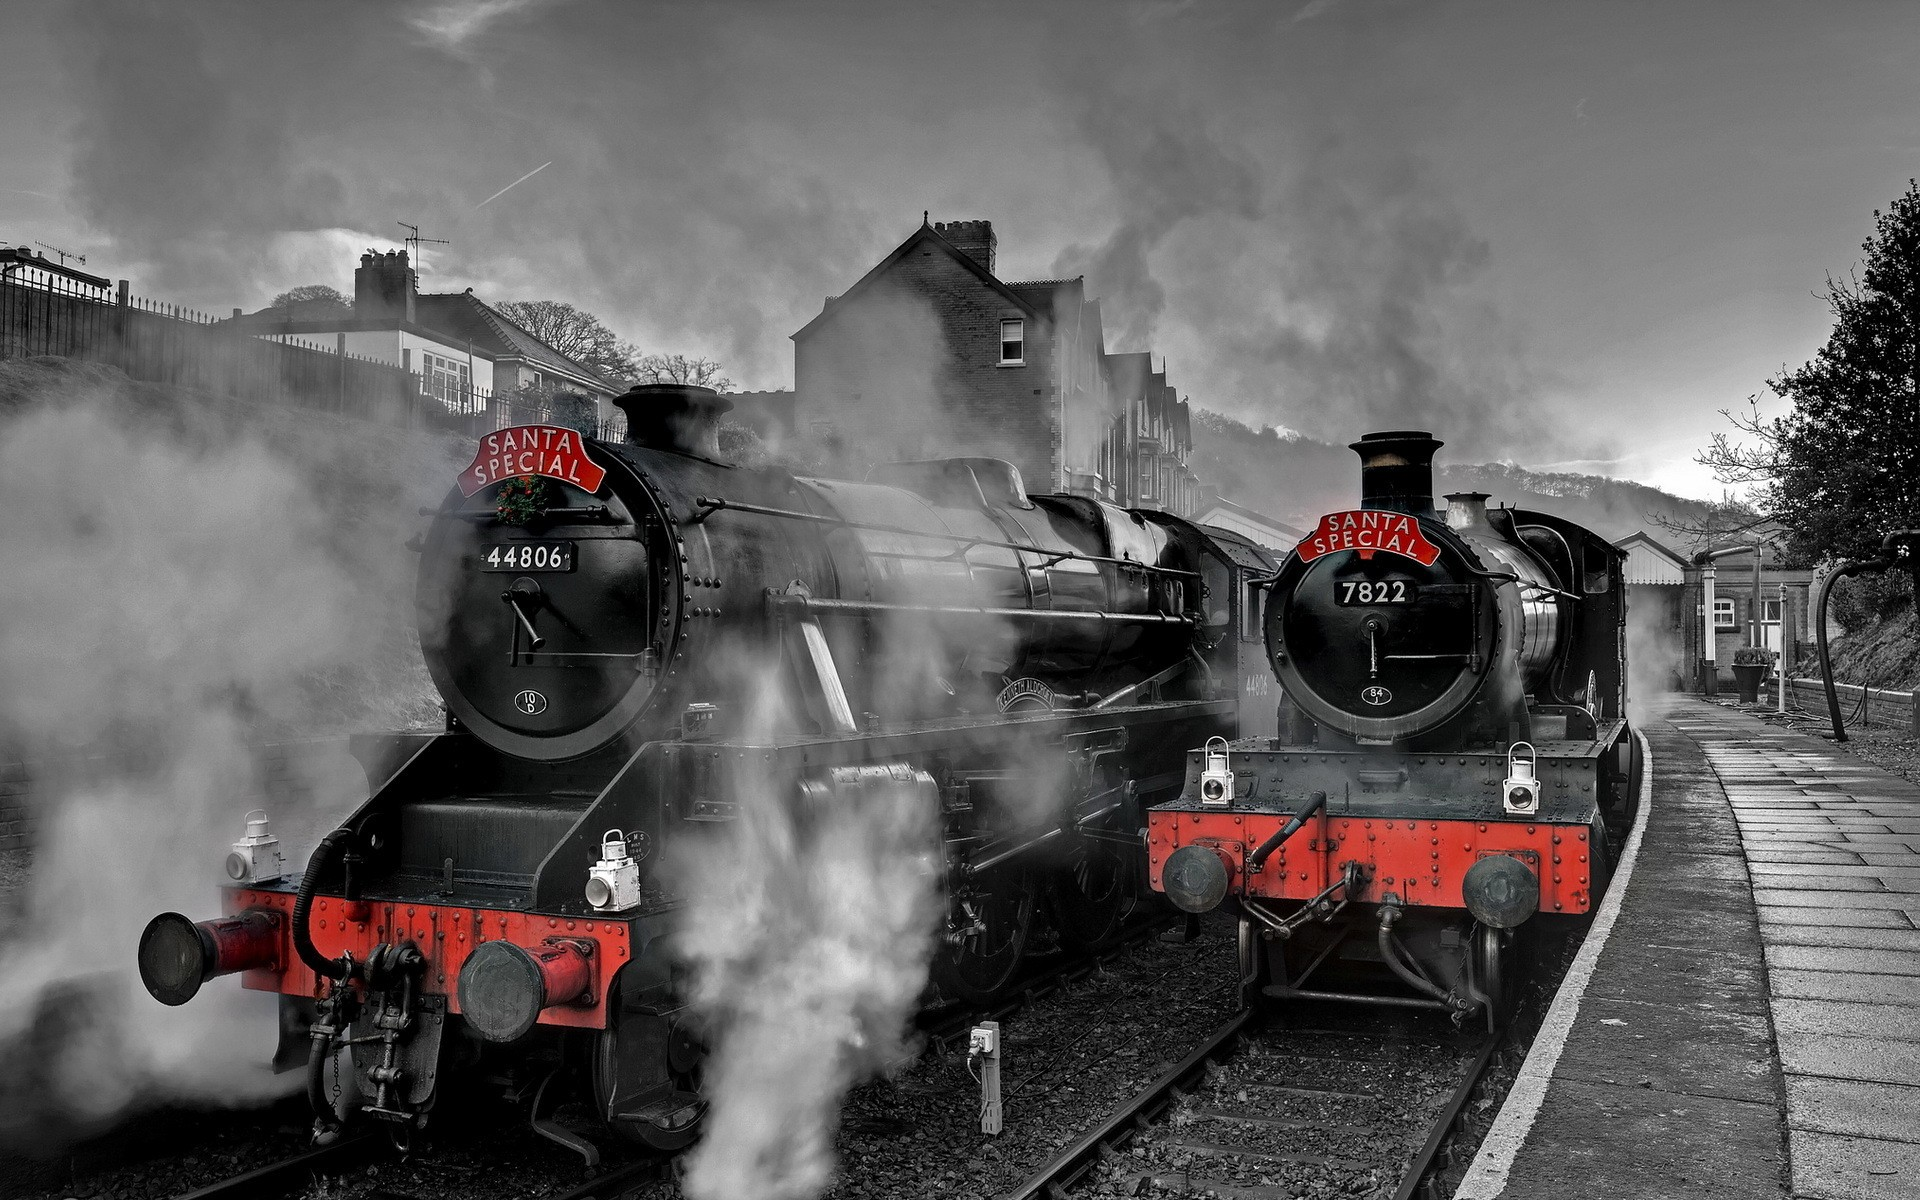 General 1920x1200 railway steam locomotive train train station trees house hills santa selective coloring